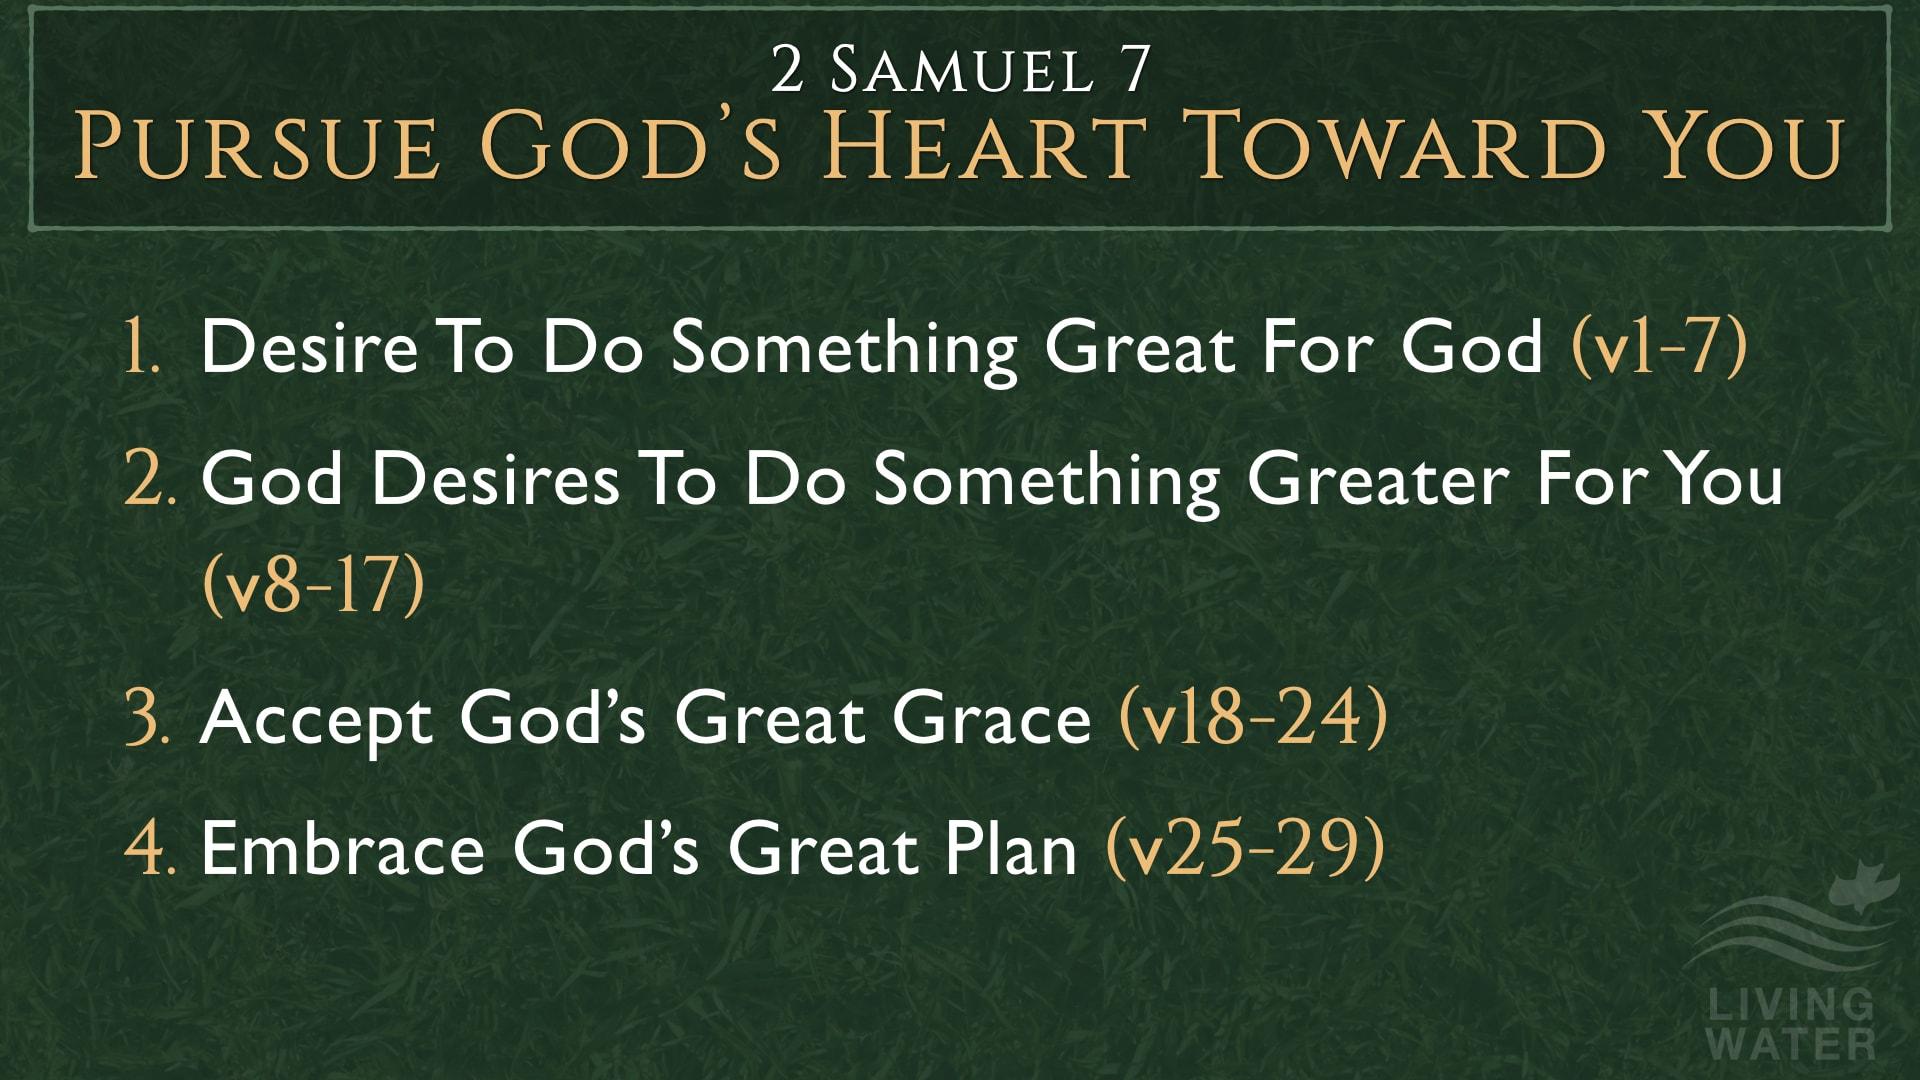 2 Samuel 7, Pursue God's Heart Toward You